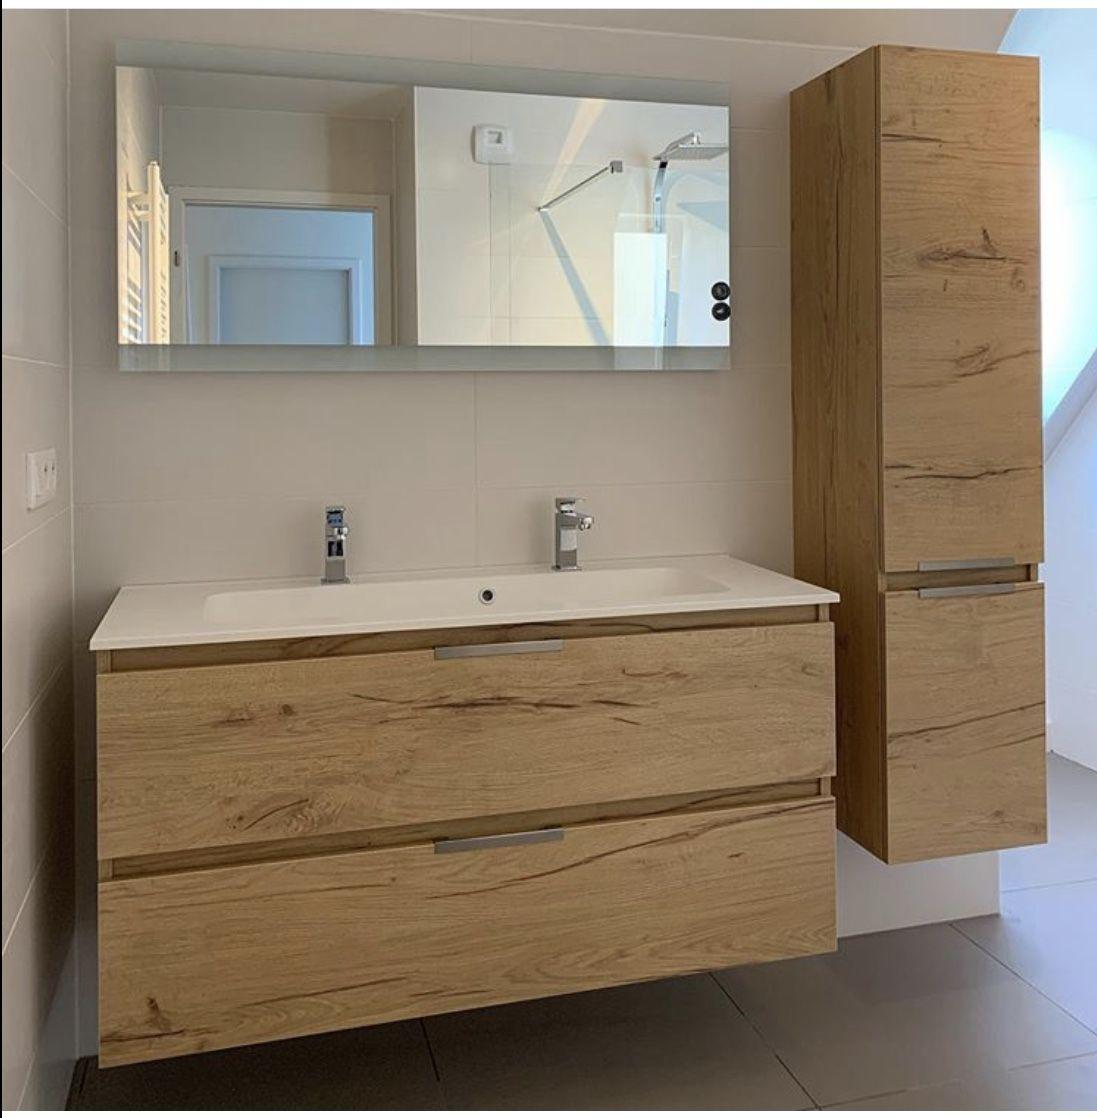 33+ Cedam salle de bain ideas in 2021